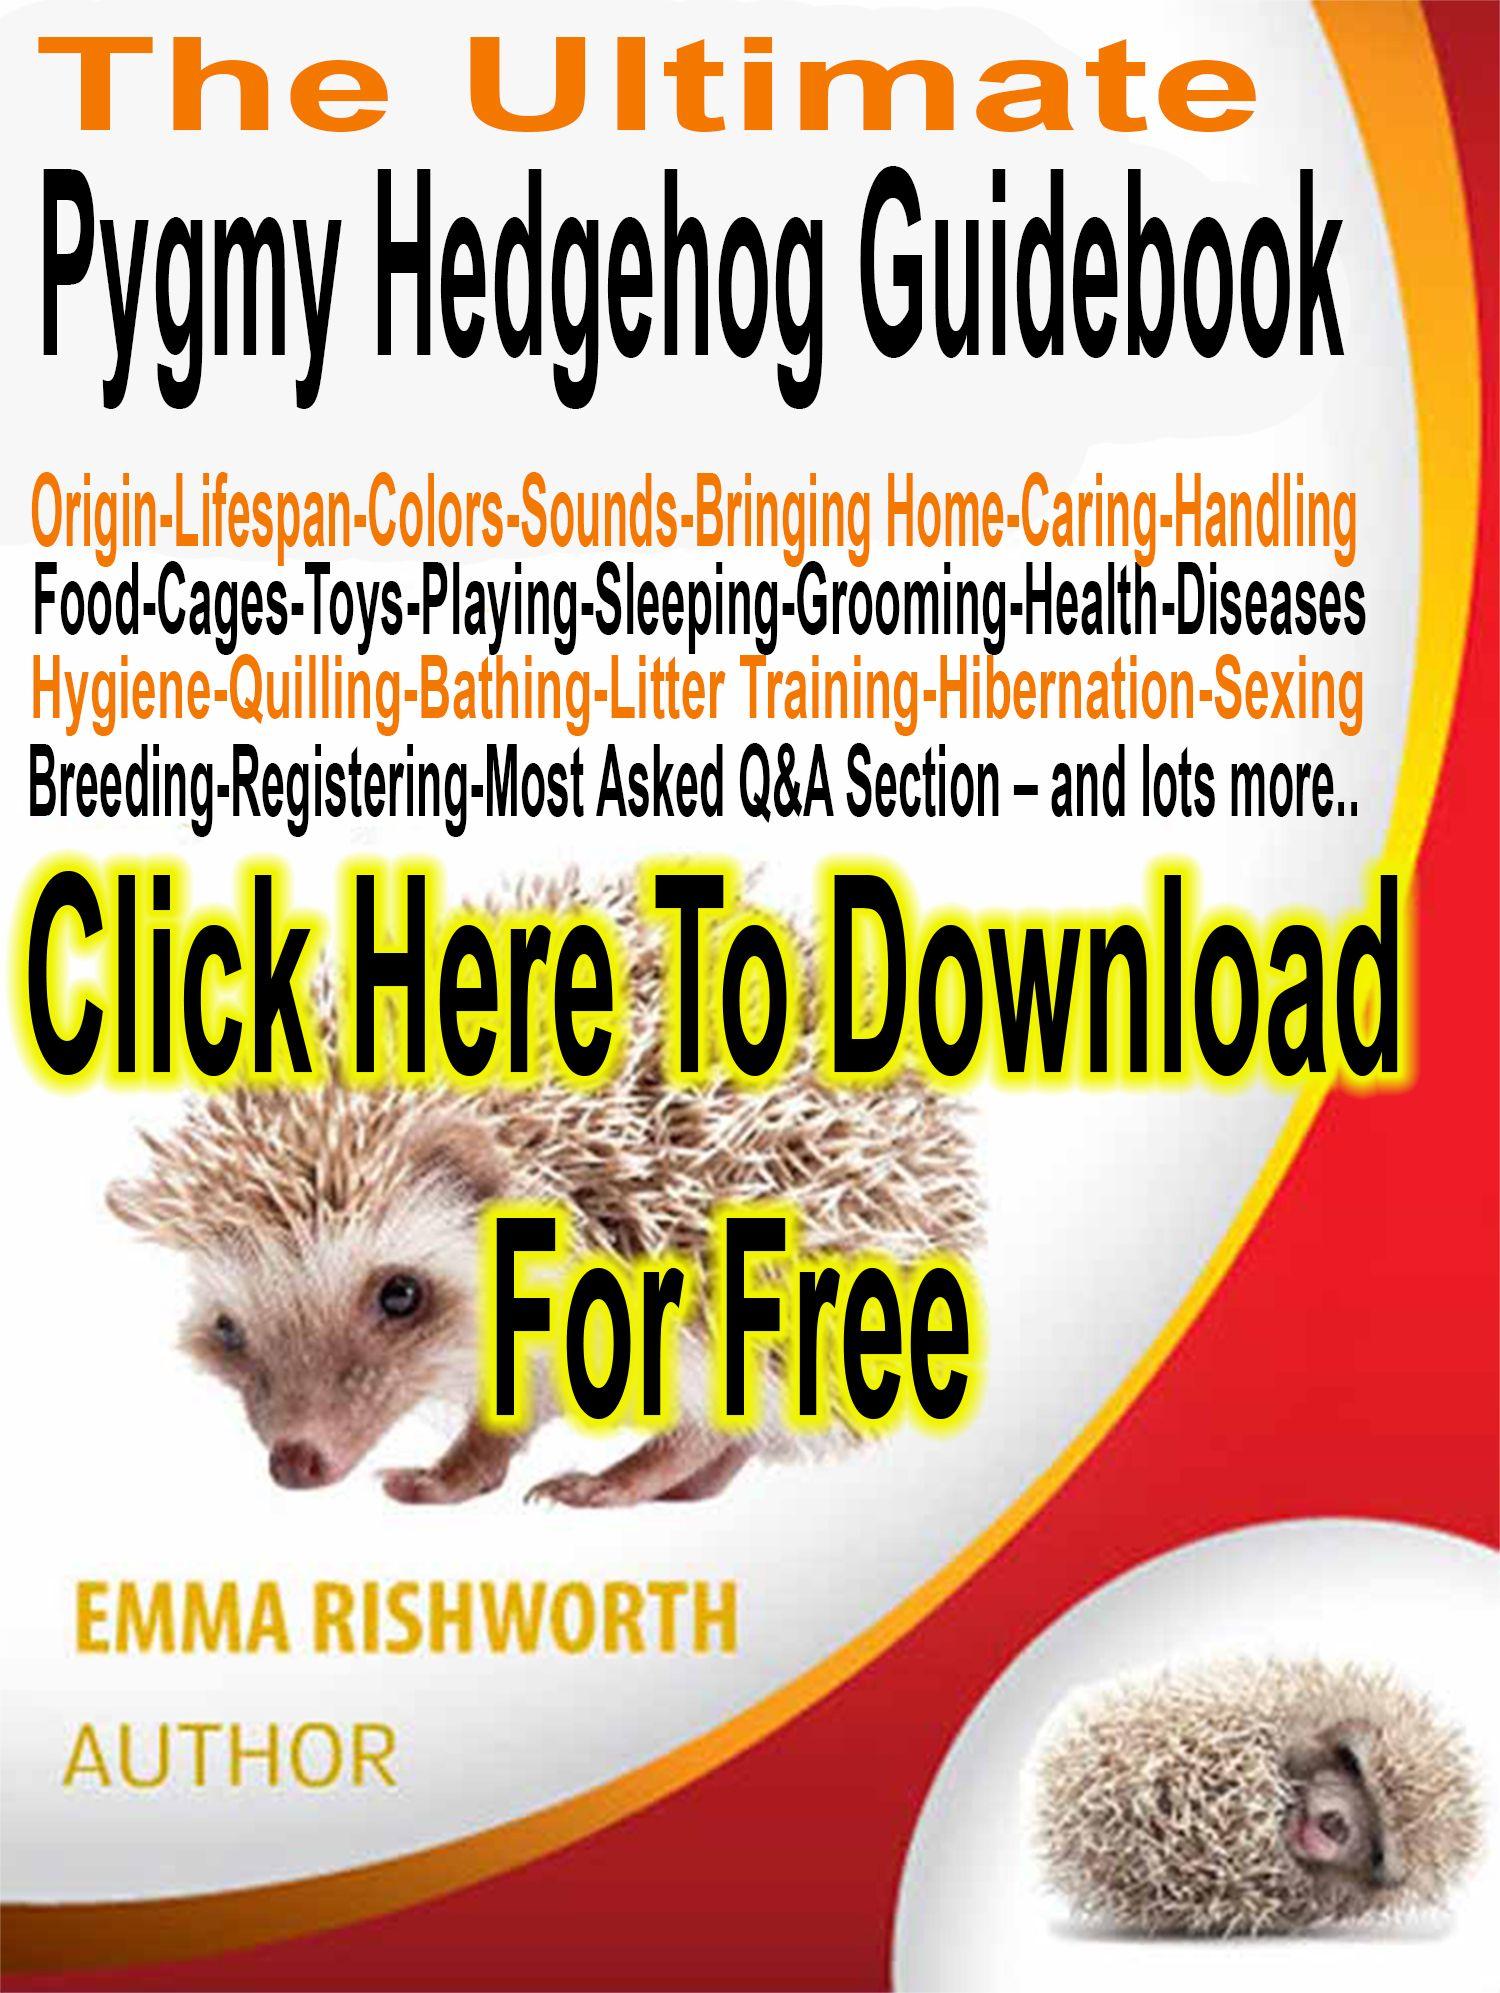 Pygmy Hedgehog For Sale Uk Hobby Breeder Pygmy Hedgehog Hedgehog For Sale Hedgehog